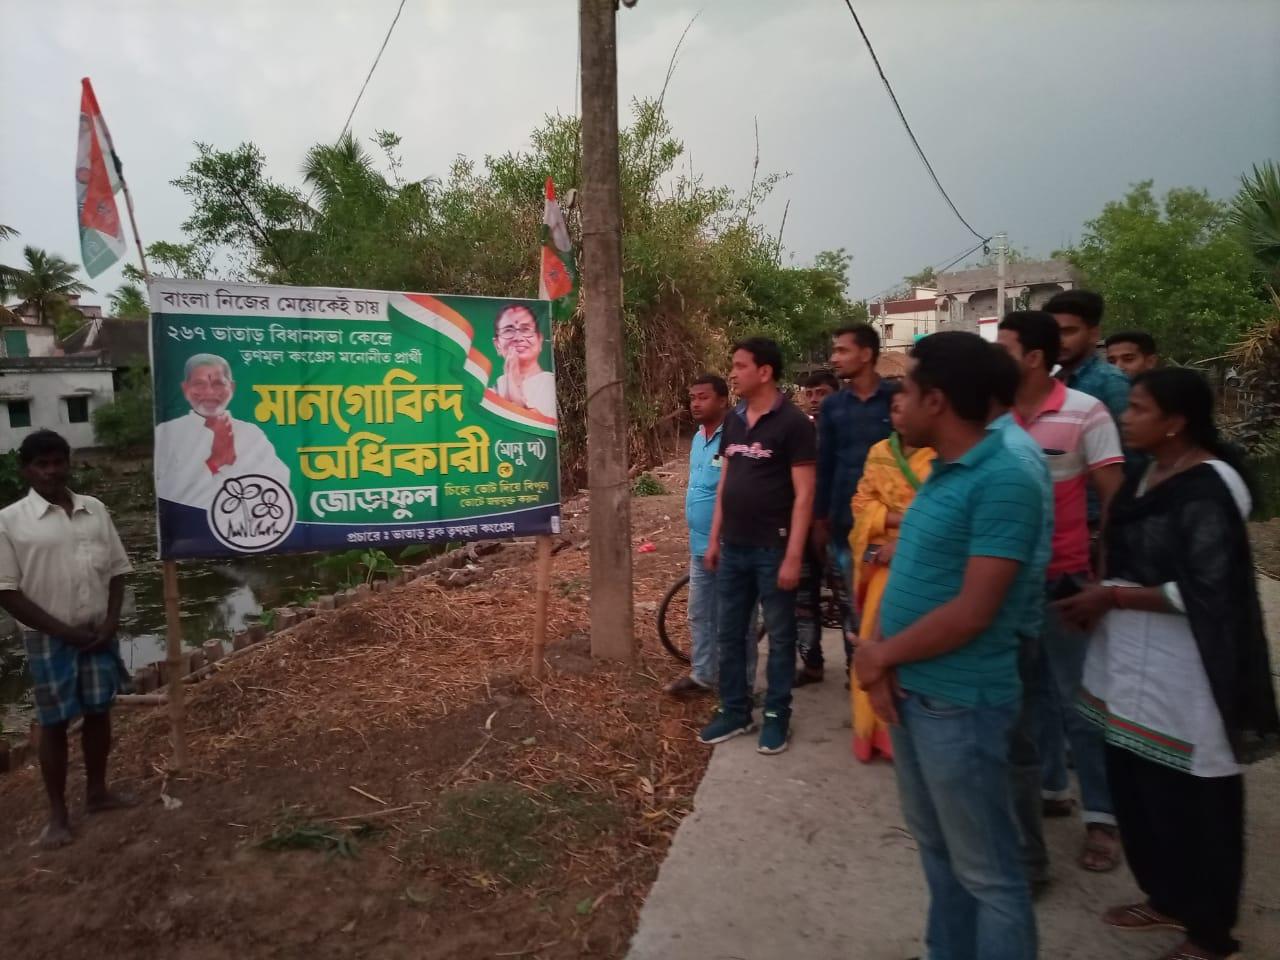 WB Election 2021: CM Mamata Banerjee's picture distorted at Bhatar | Sangbad Pratidin